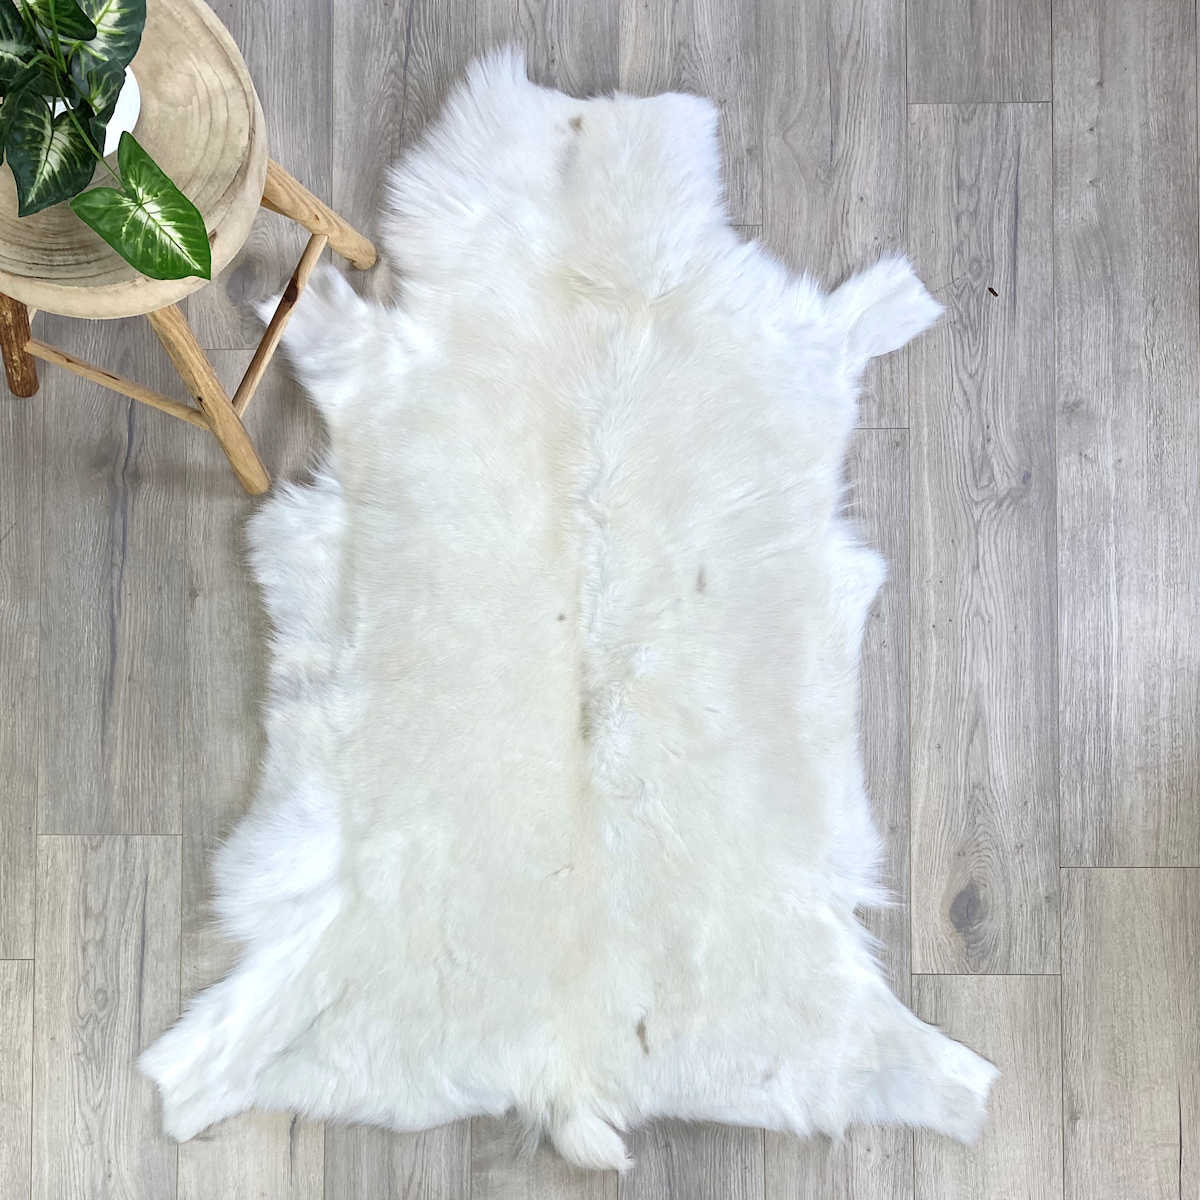 white reindeer skin - 25